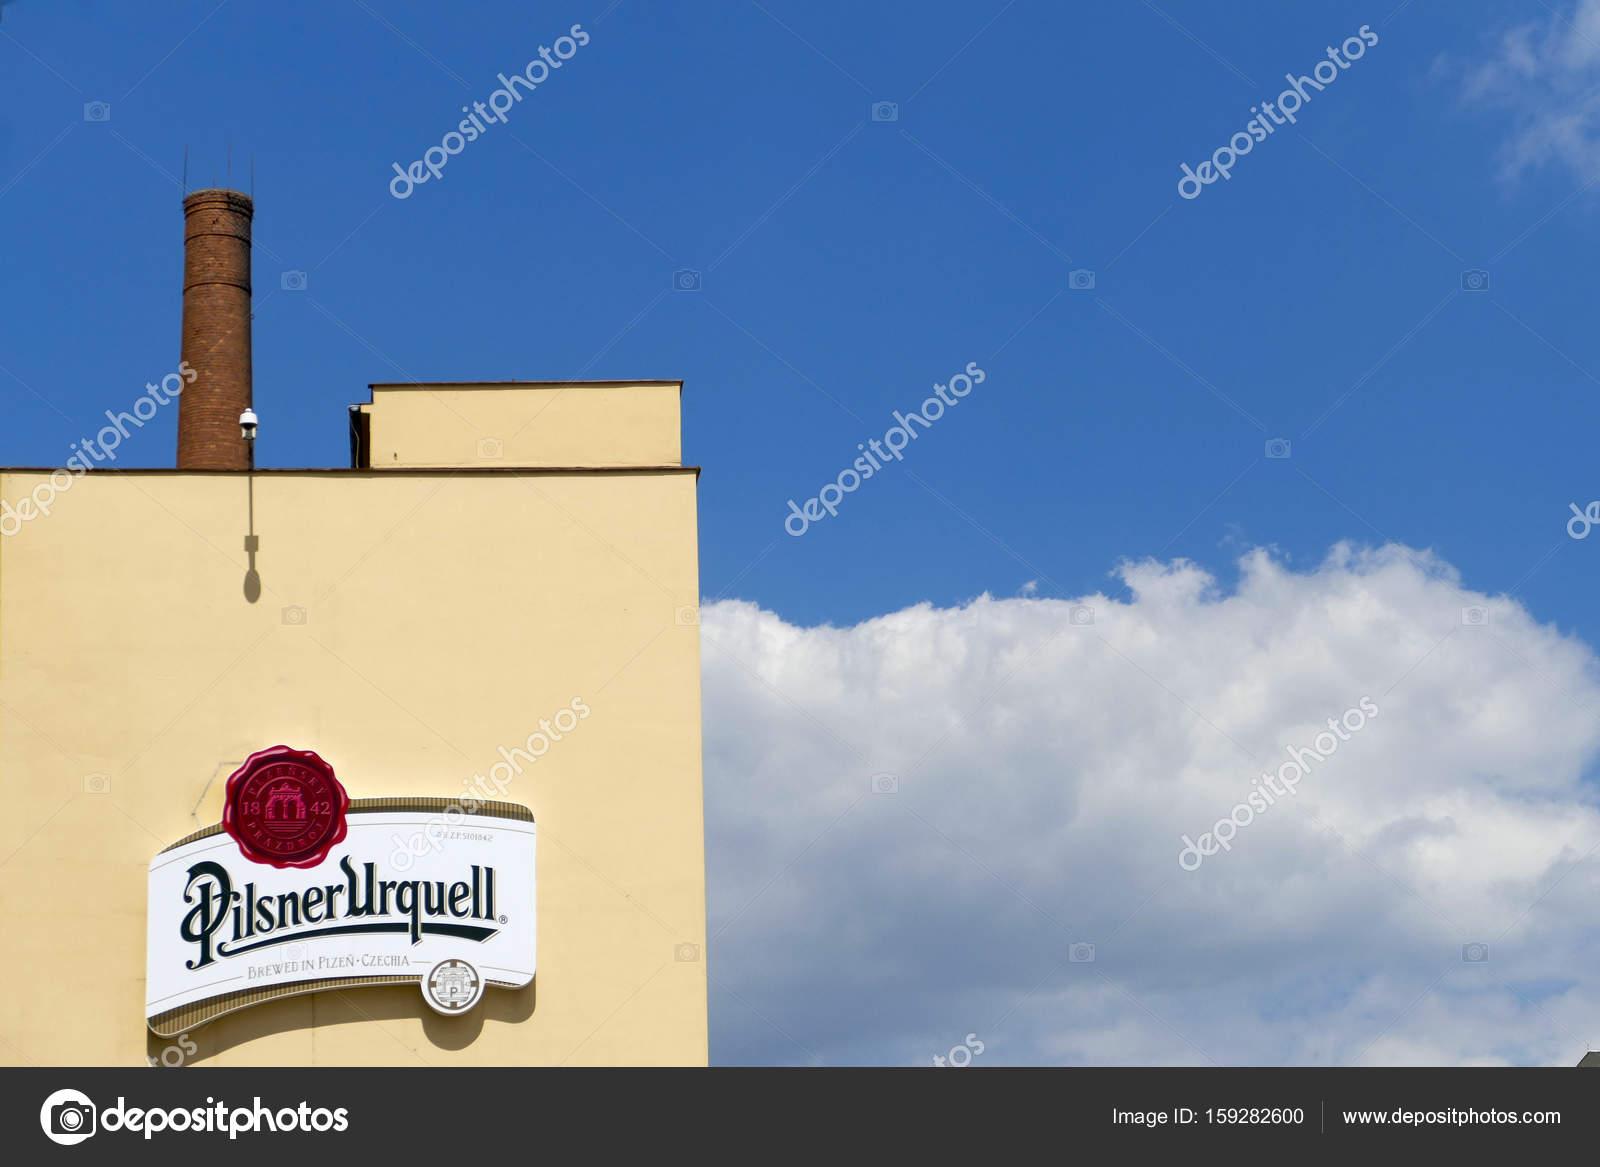 0af99ade093f90 pilsner urquell brewery – Stock Editorial Photo © casadaphoto  159282600